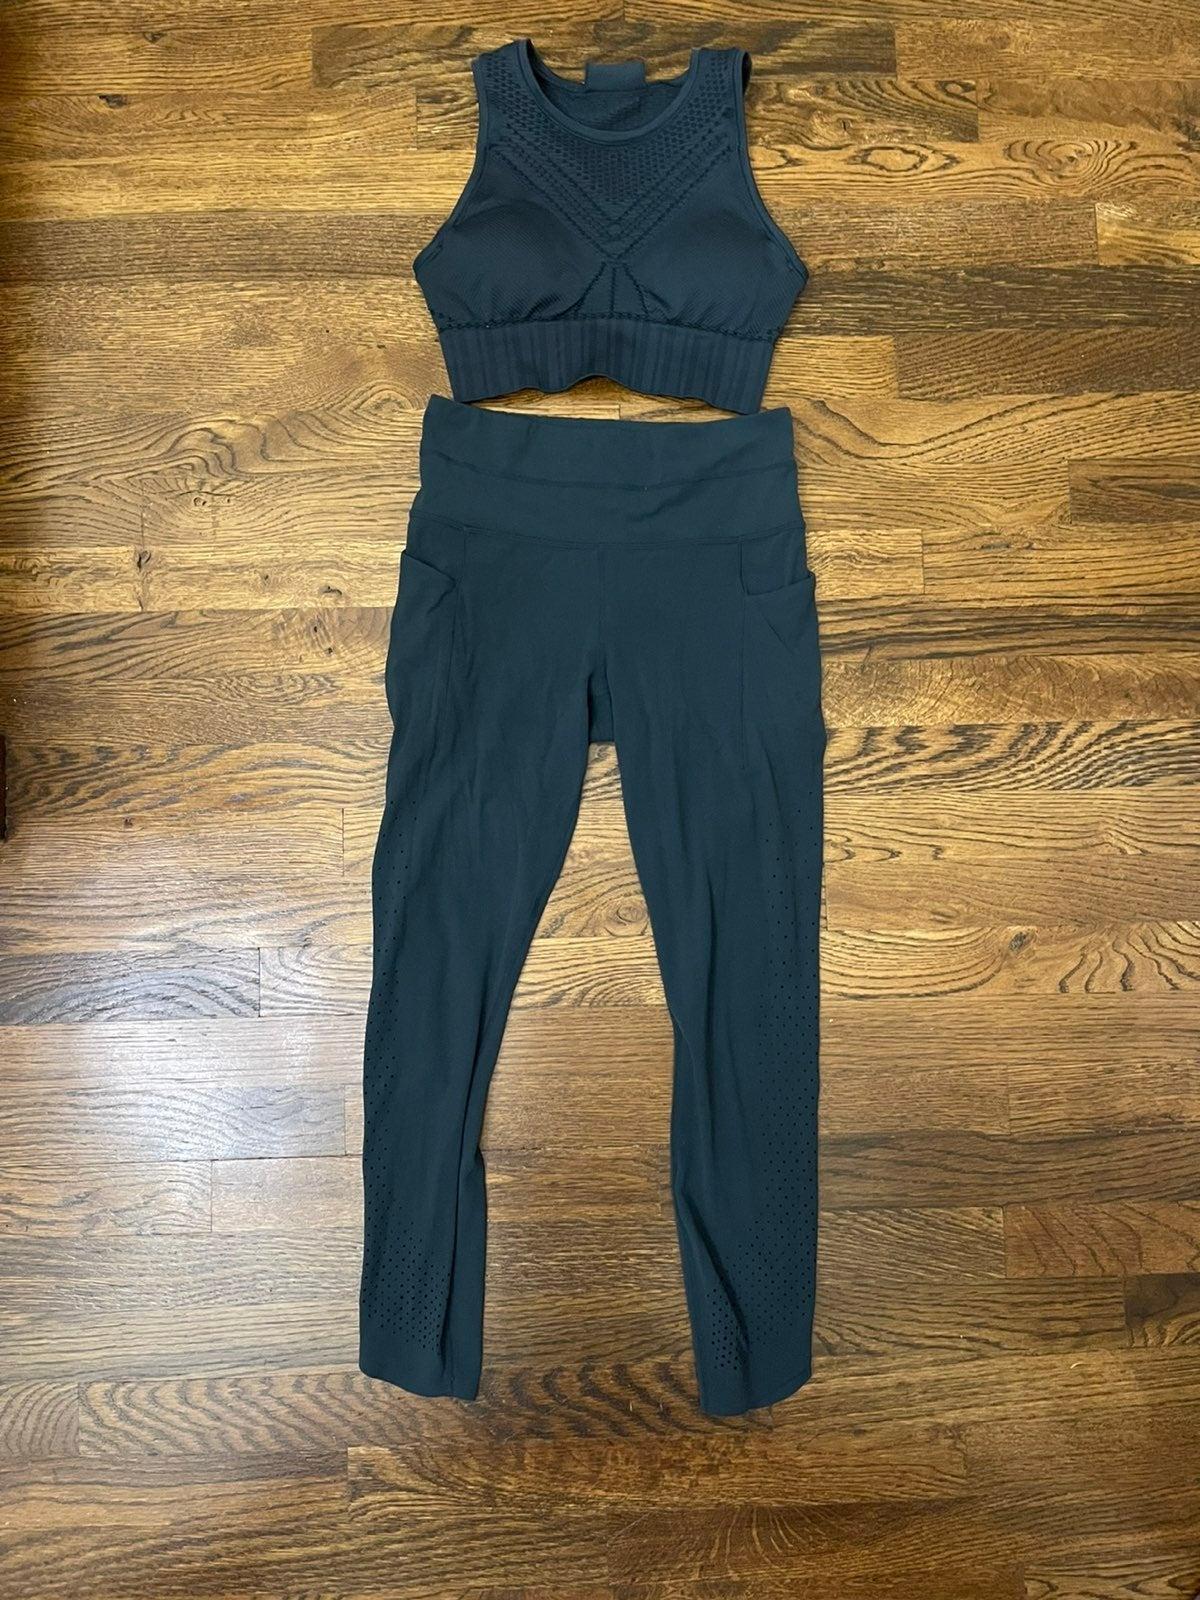 Athleta Bra/ leggings set, XS/ S